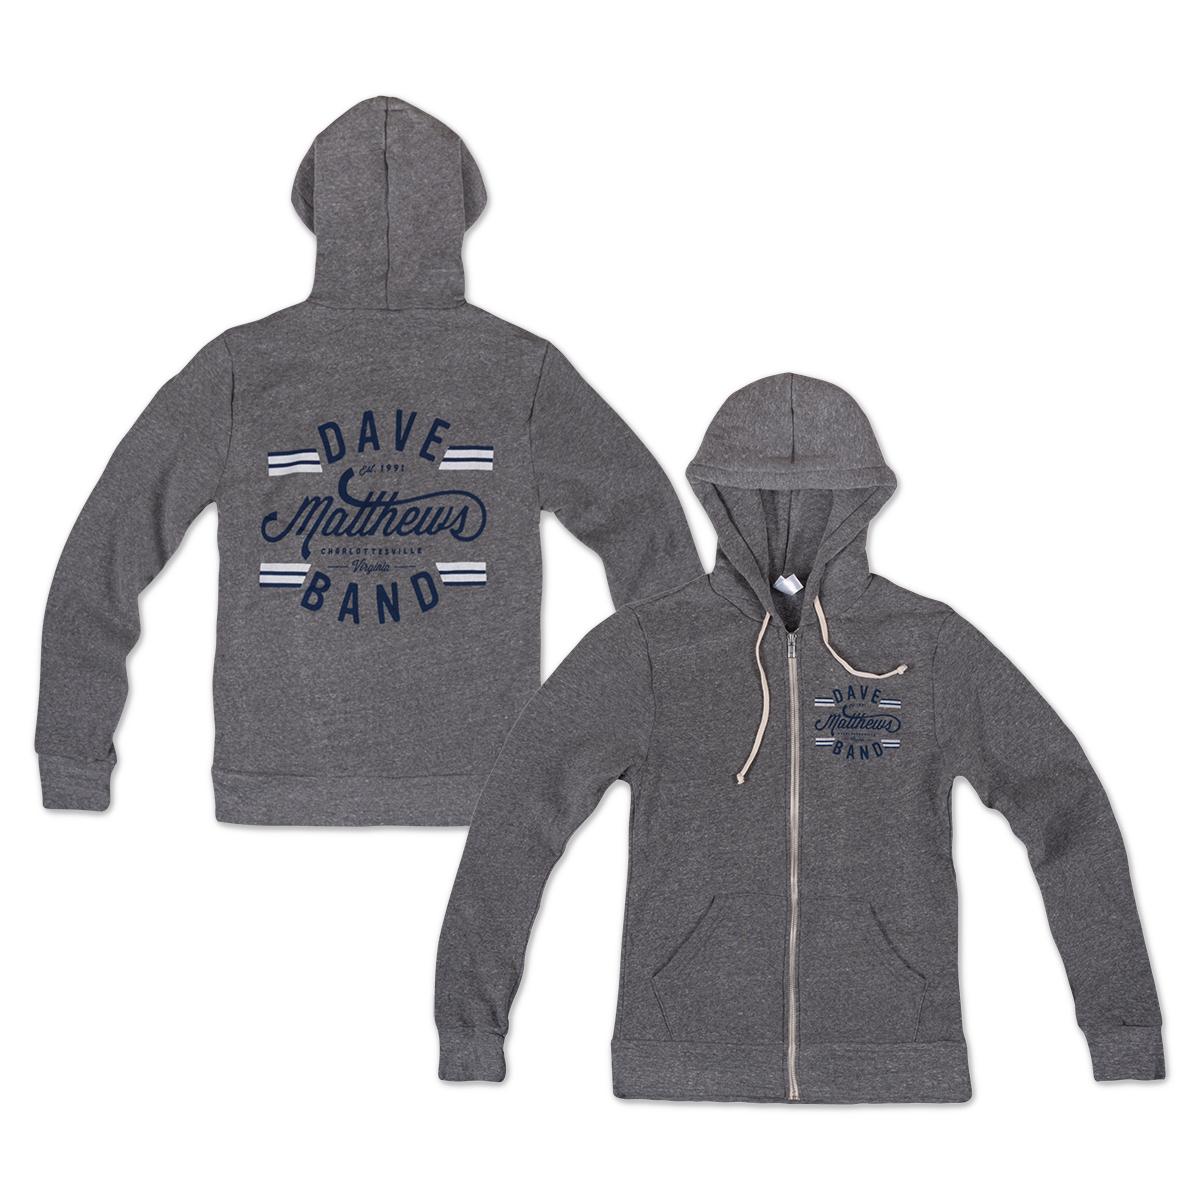 Dave Matthews Band Grey Zip Hoodie